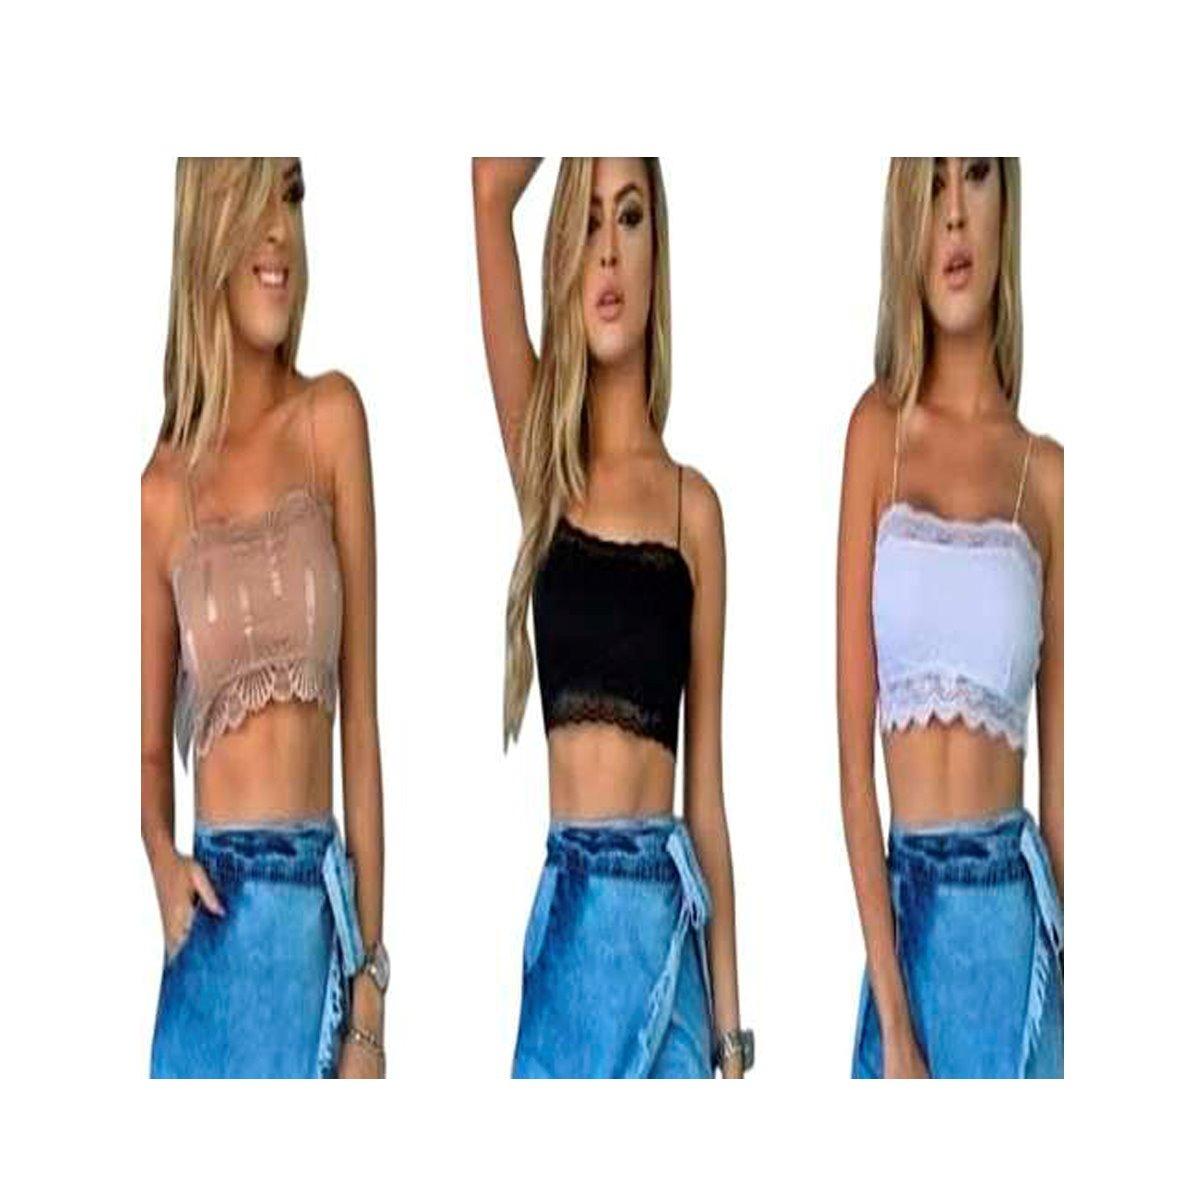 2ffb30fc4 kit c/2 tops cropped renda alça blusa com bojos top sutiã · cropped alça  blusa. cropped alça blusa. 5 Fotos